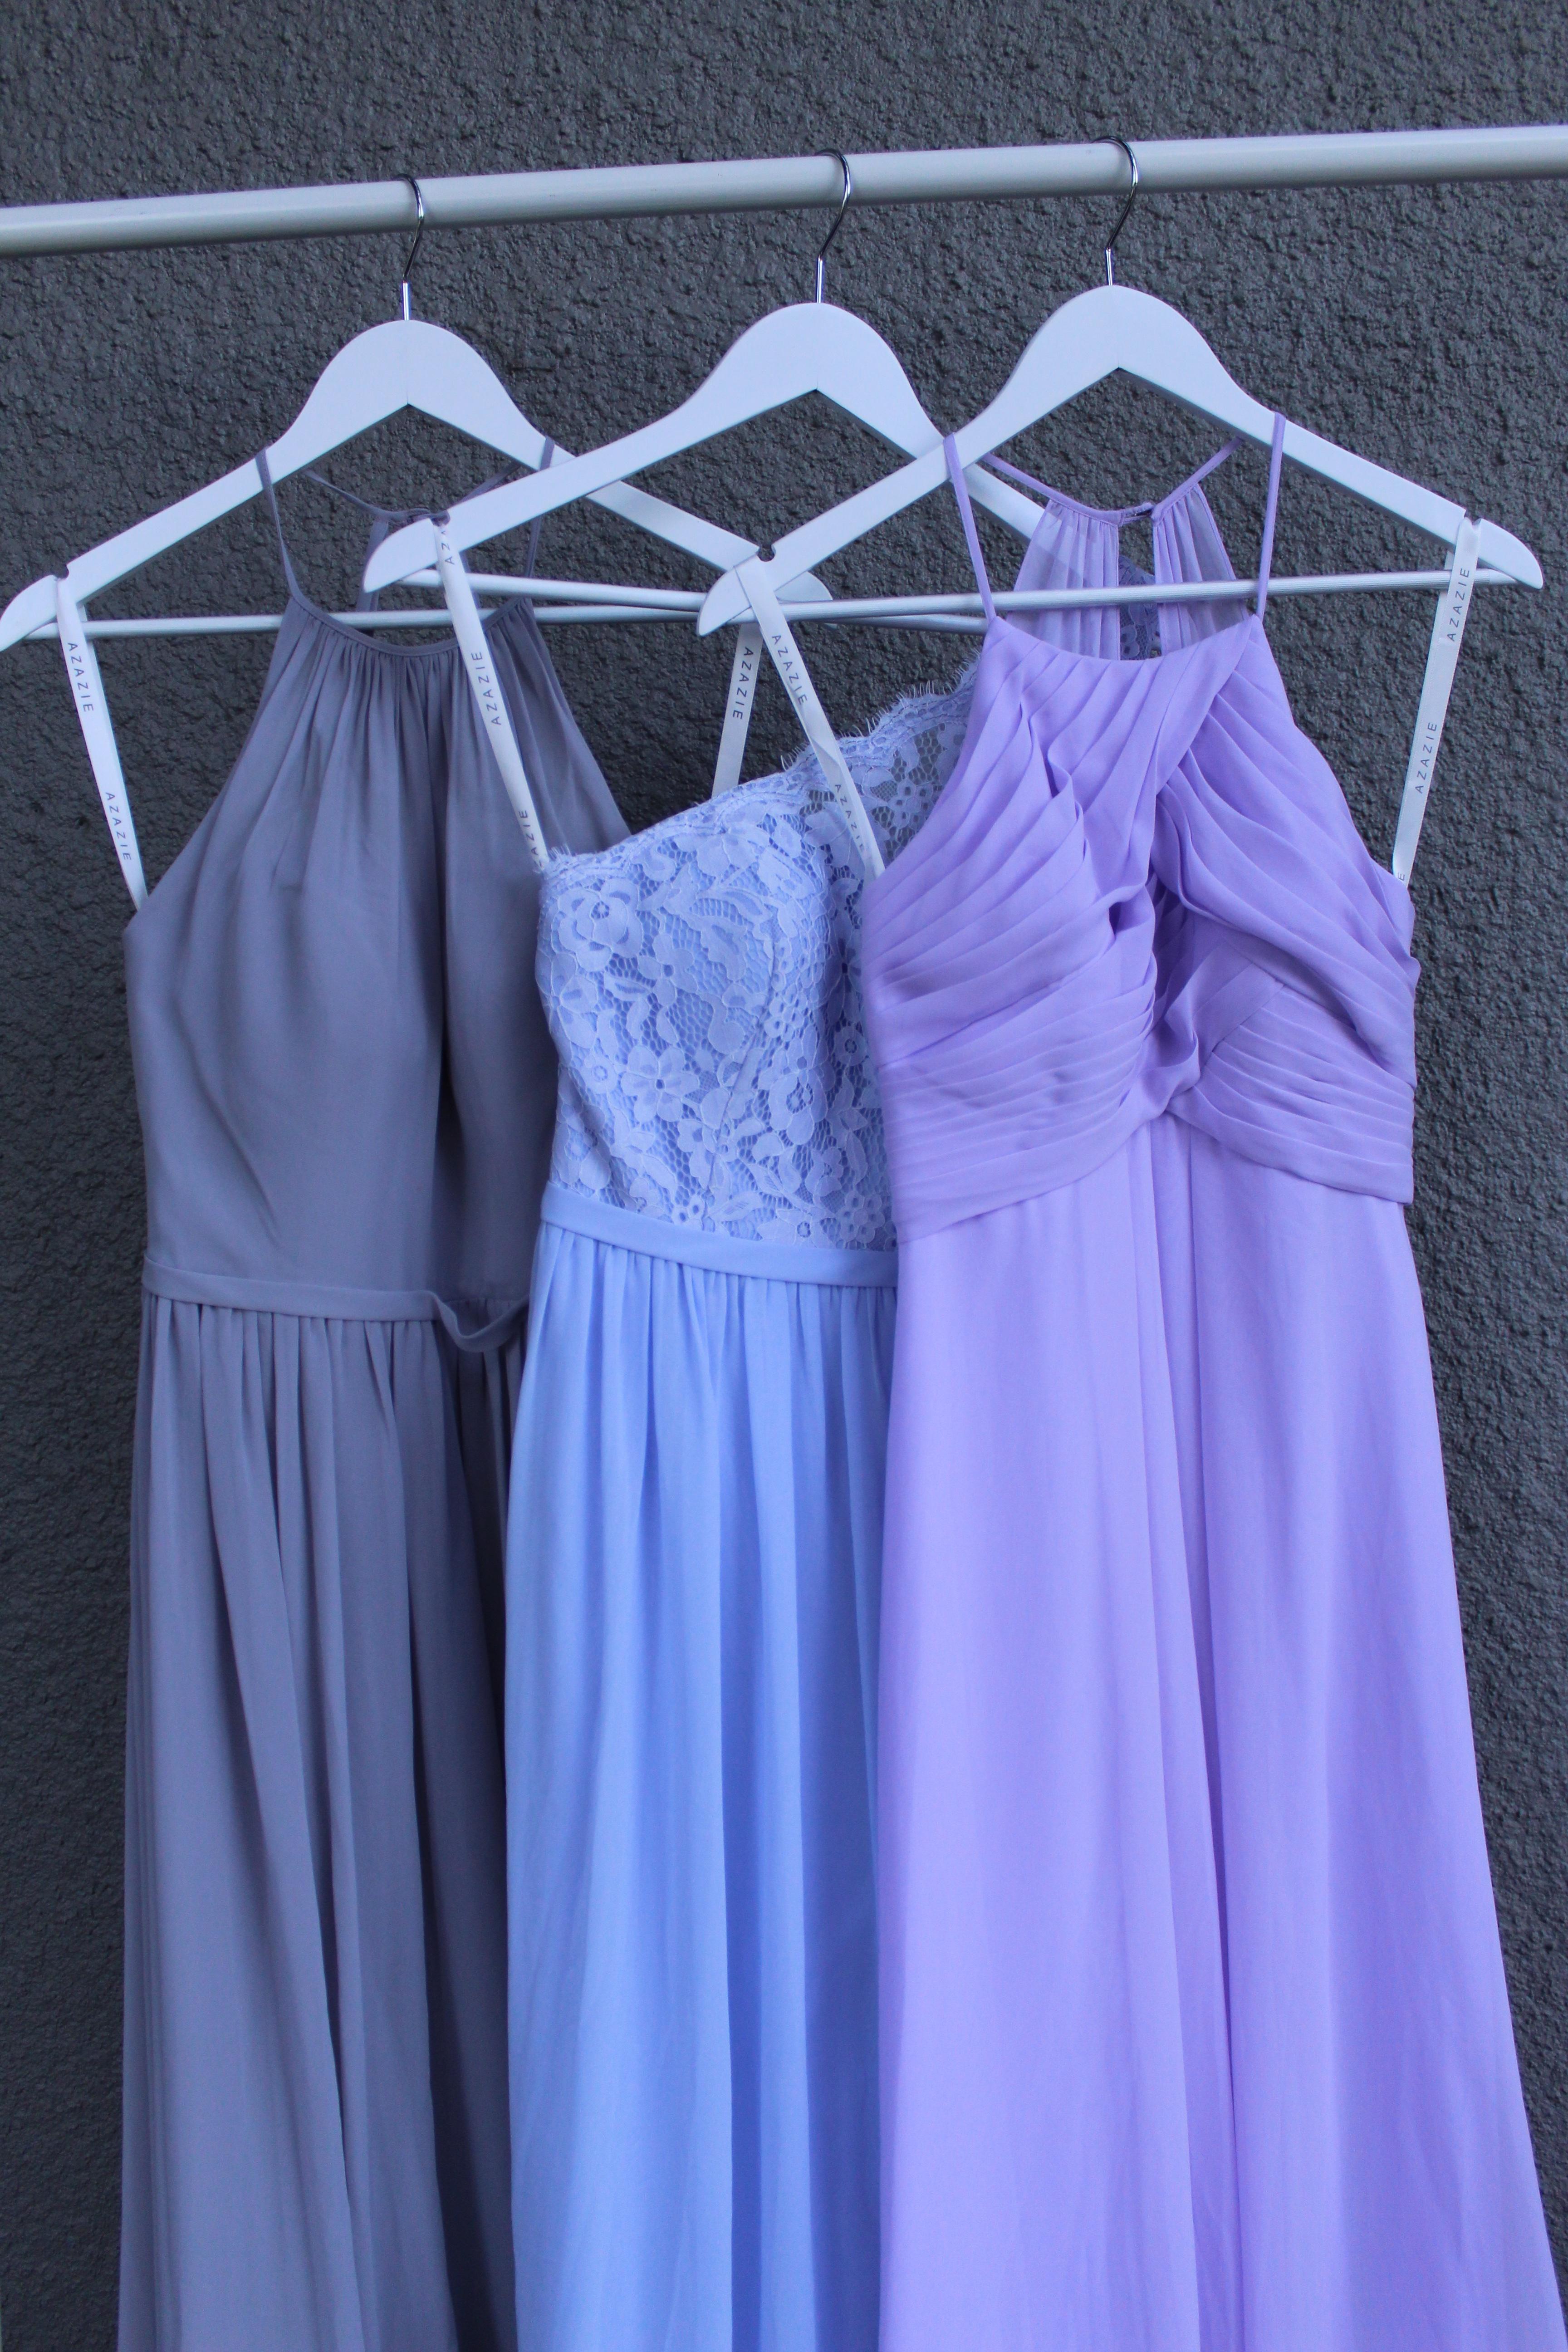 Fog Lavender Lilac Shade